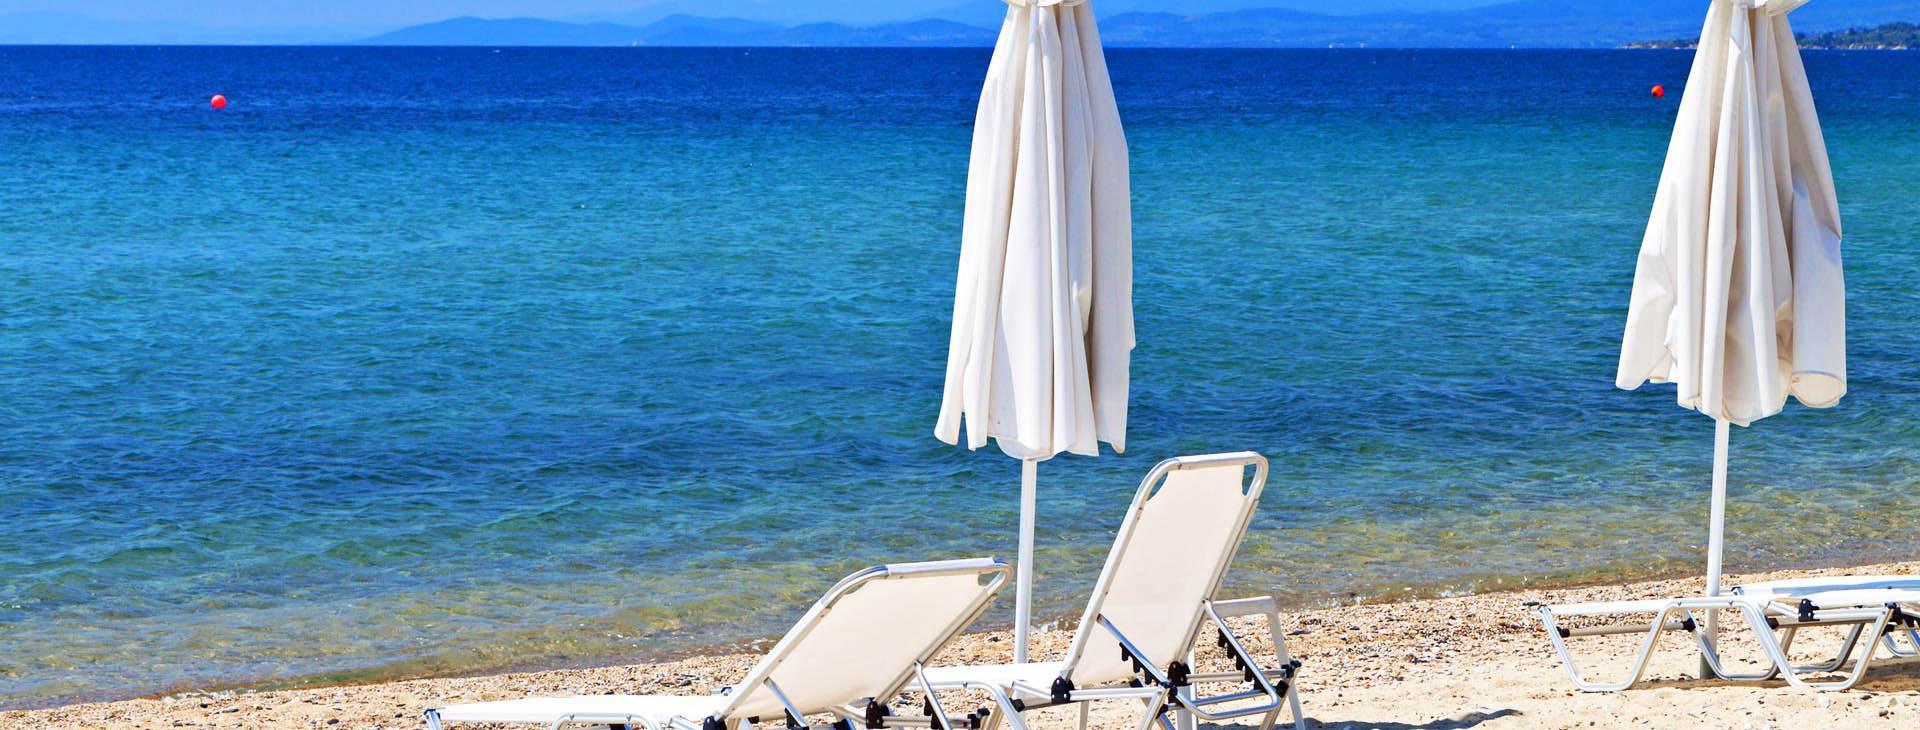 Beach at Amorgos island